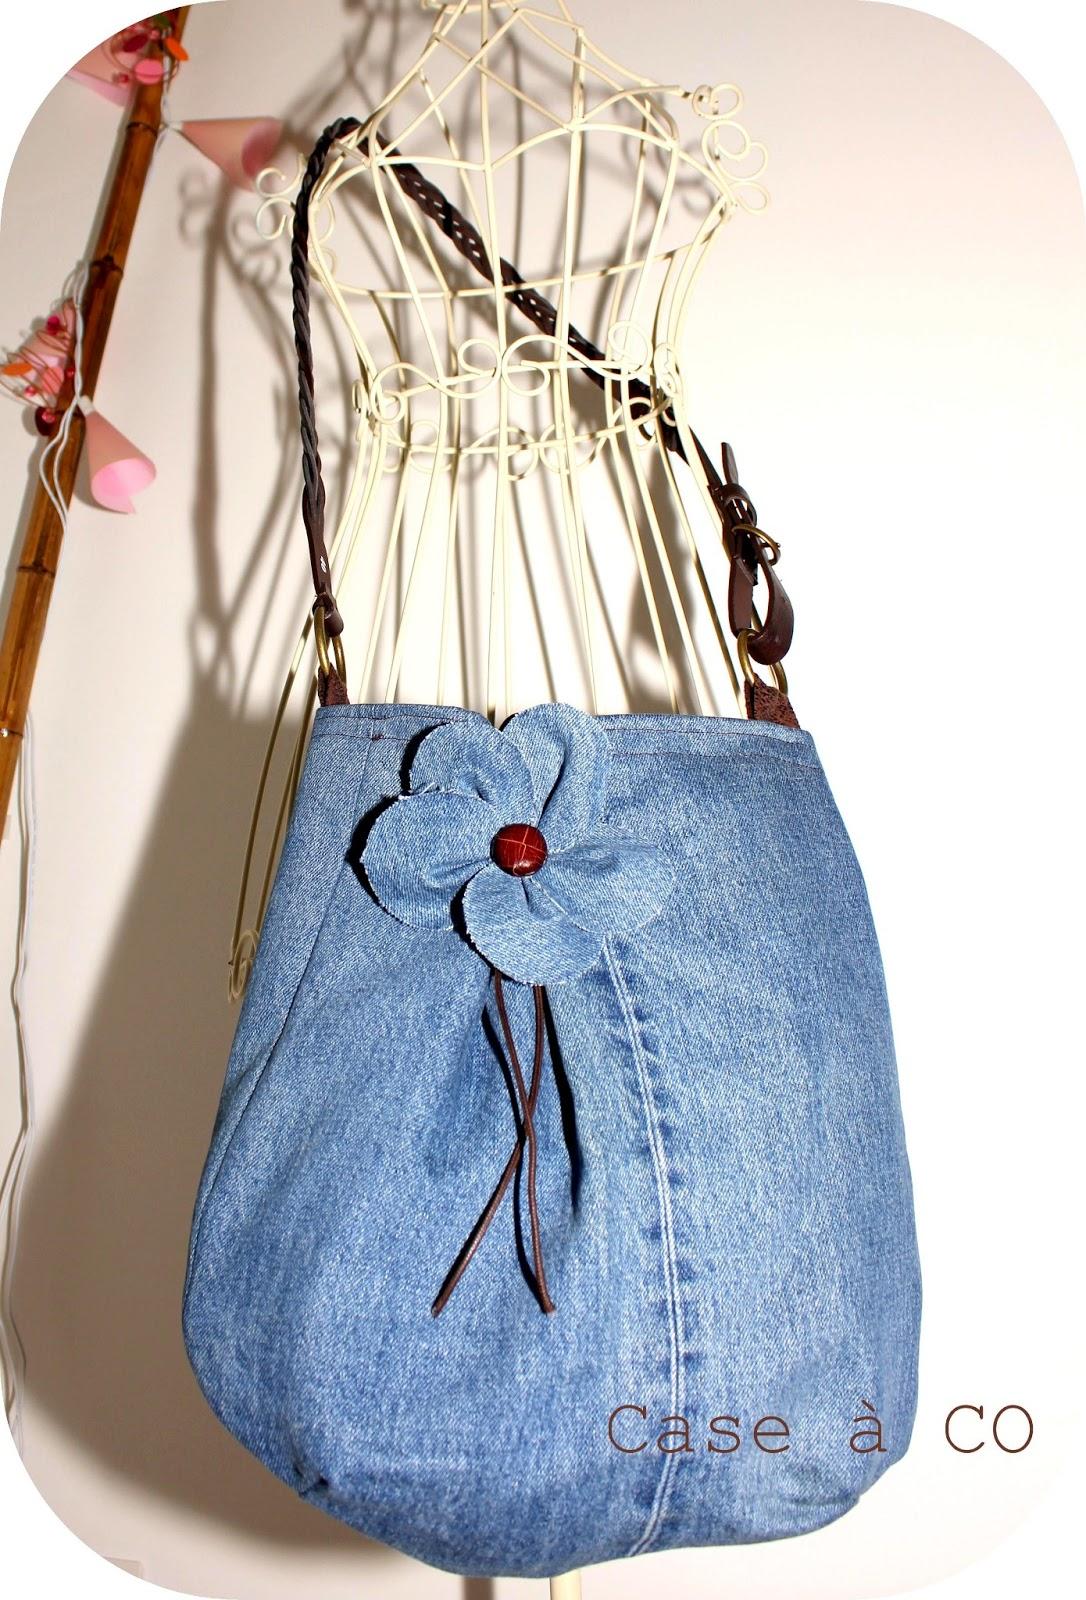 Case co sac jean 100 r cup - Faire un sac avec un jean ...